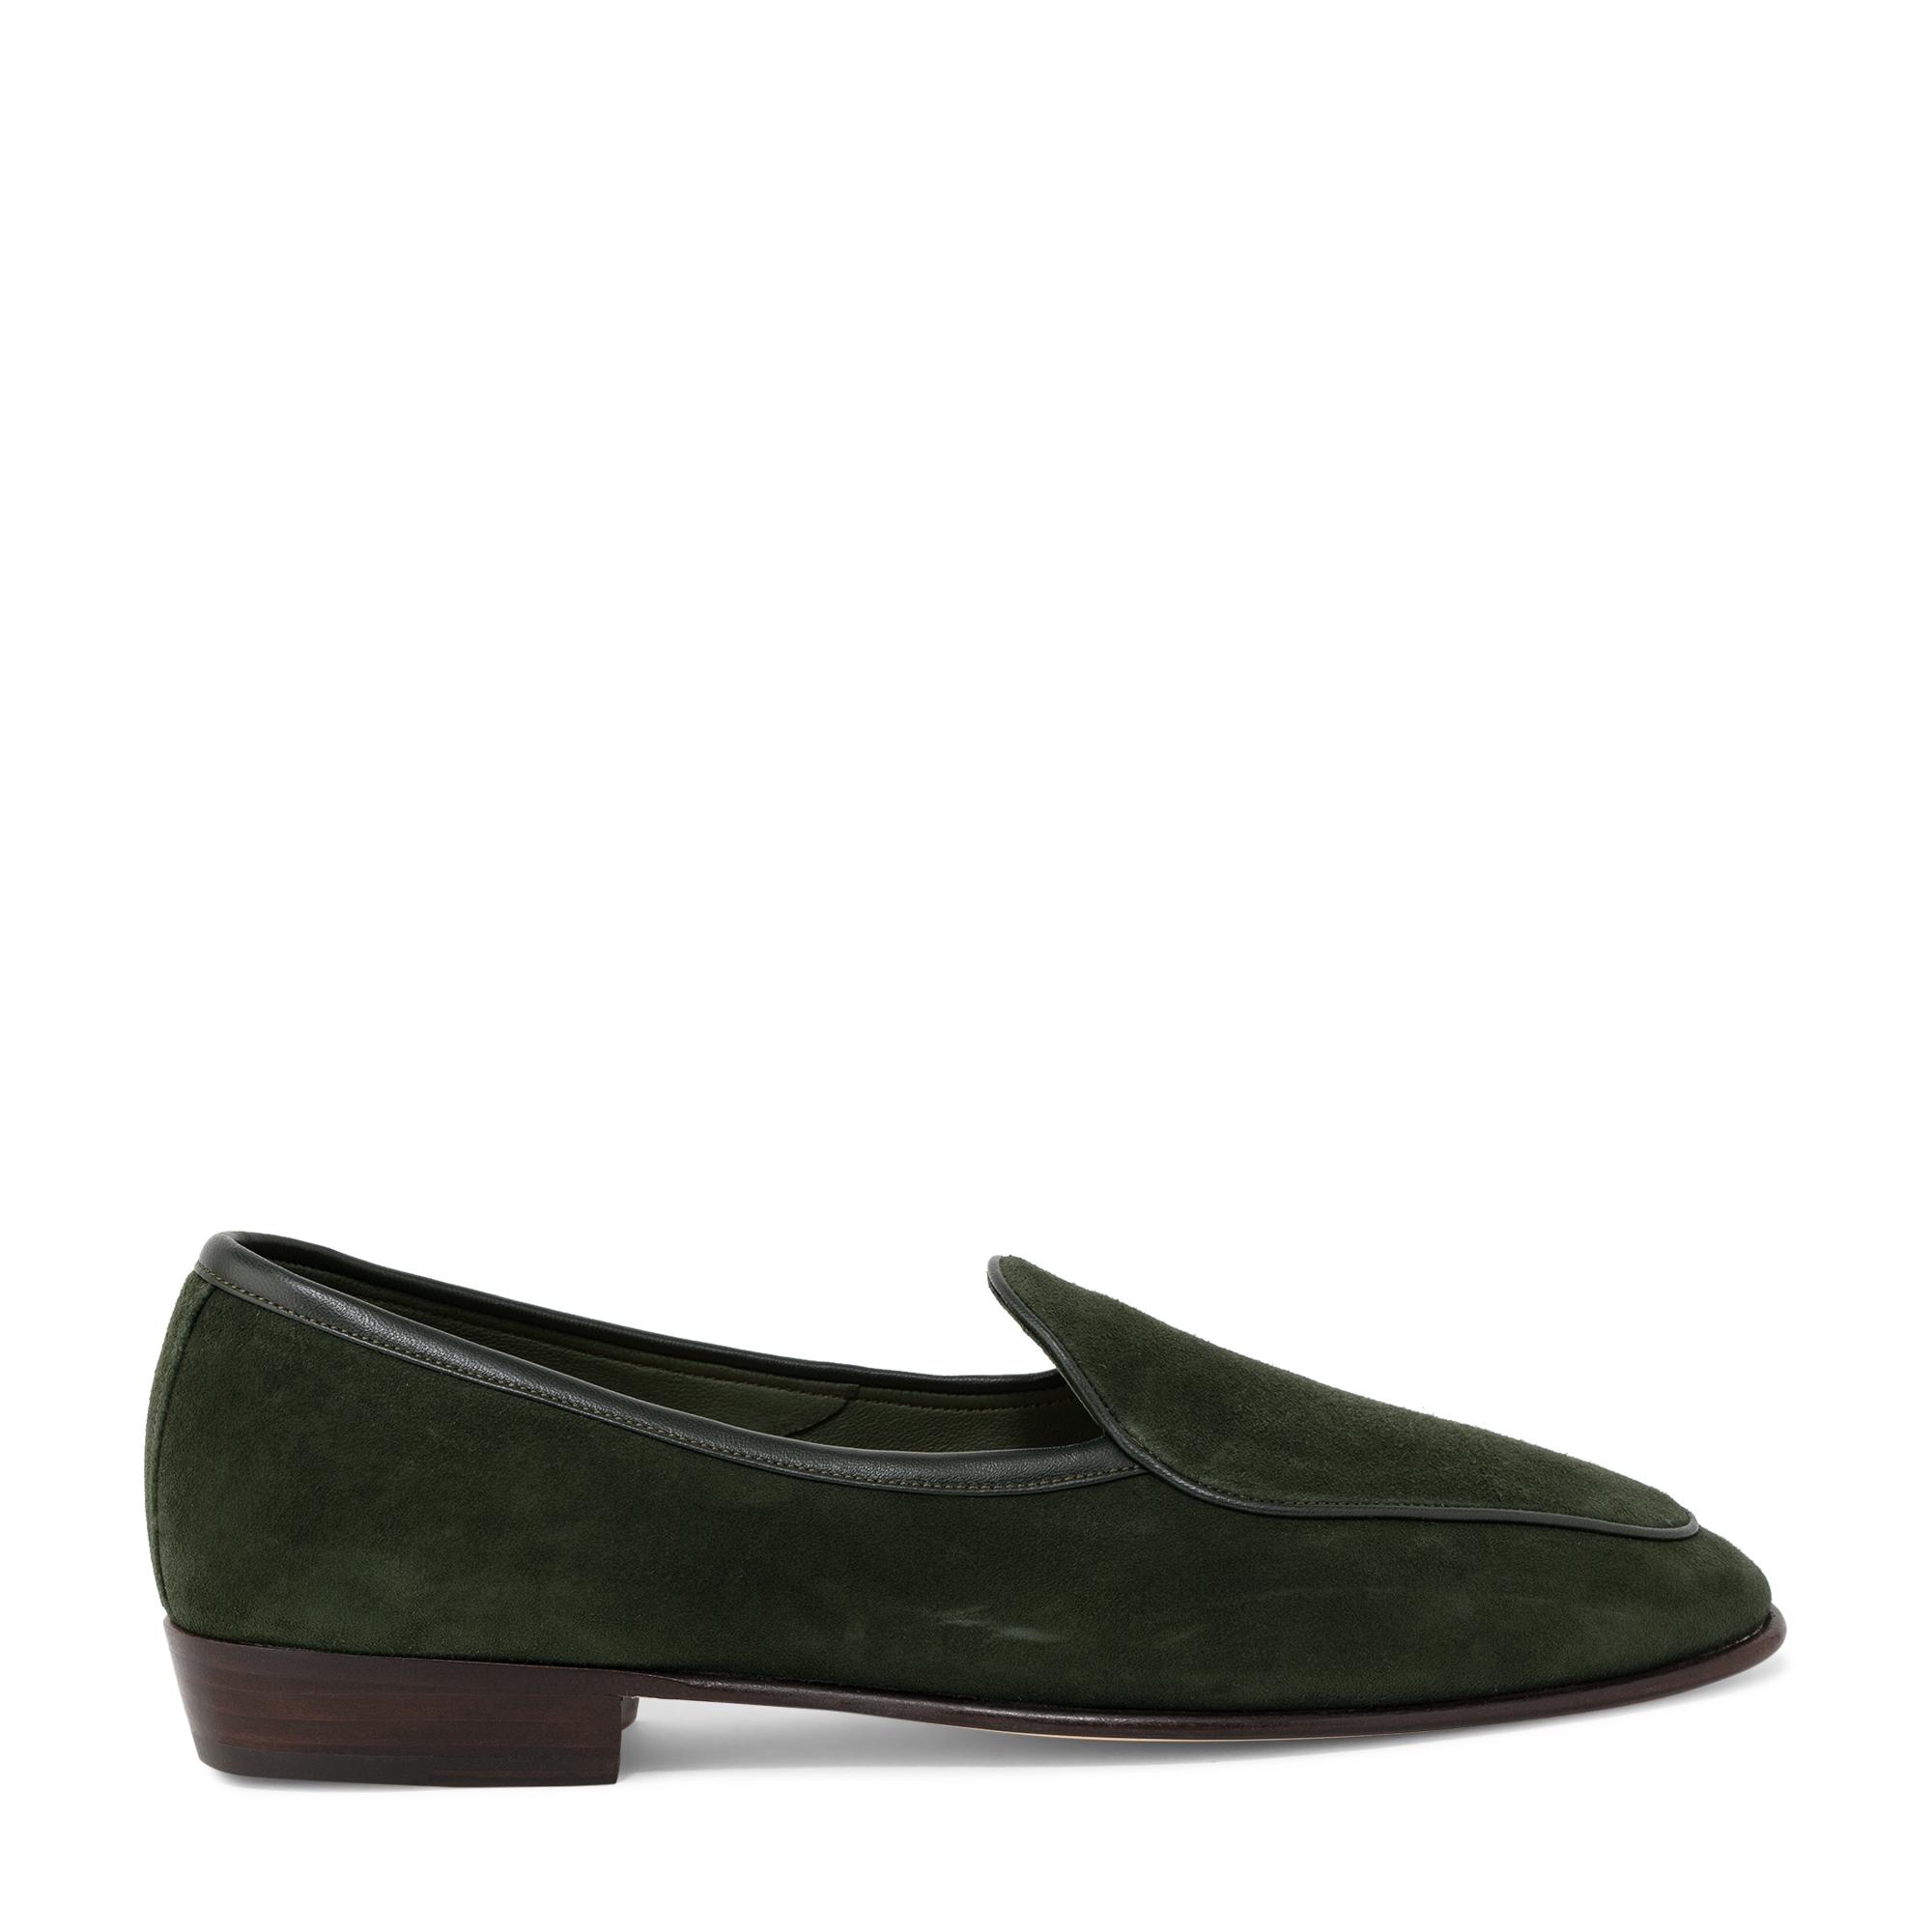 Sagan Classic Plain loafers